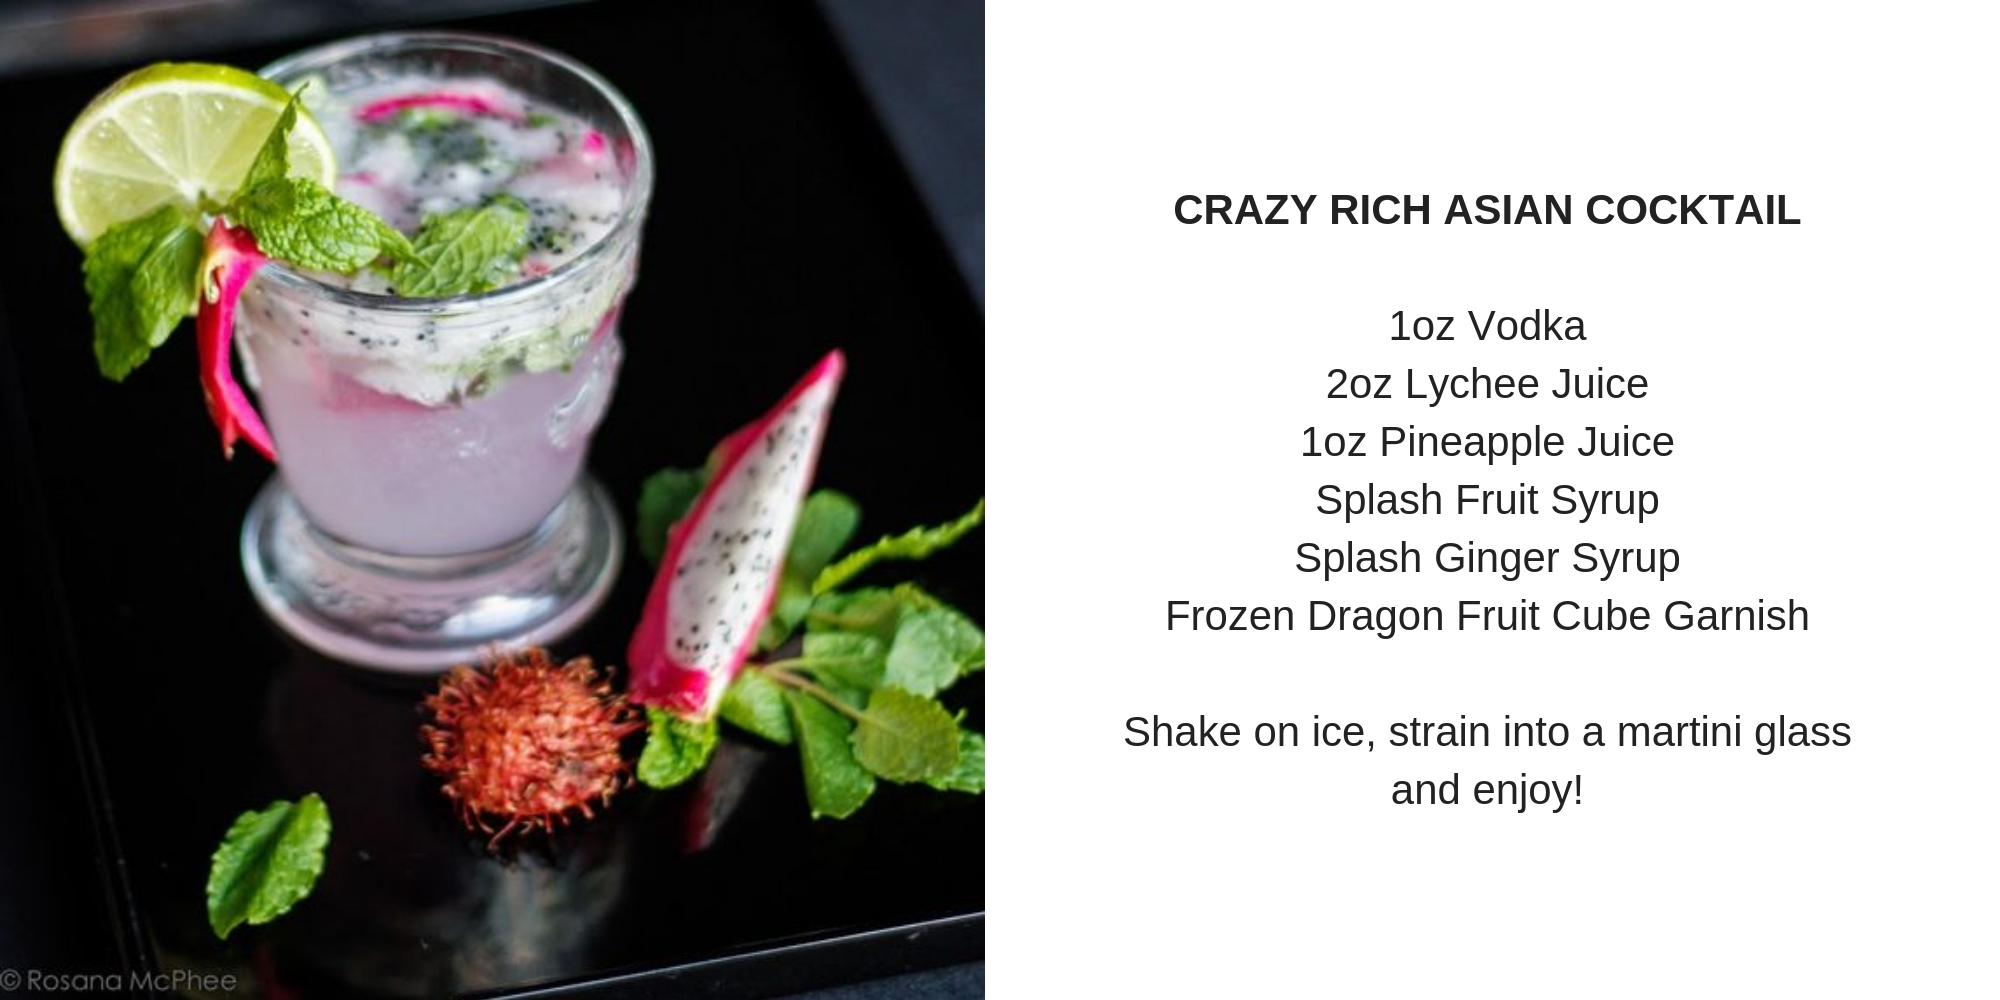 Crazy Rich Asian Cocktail